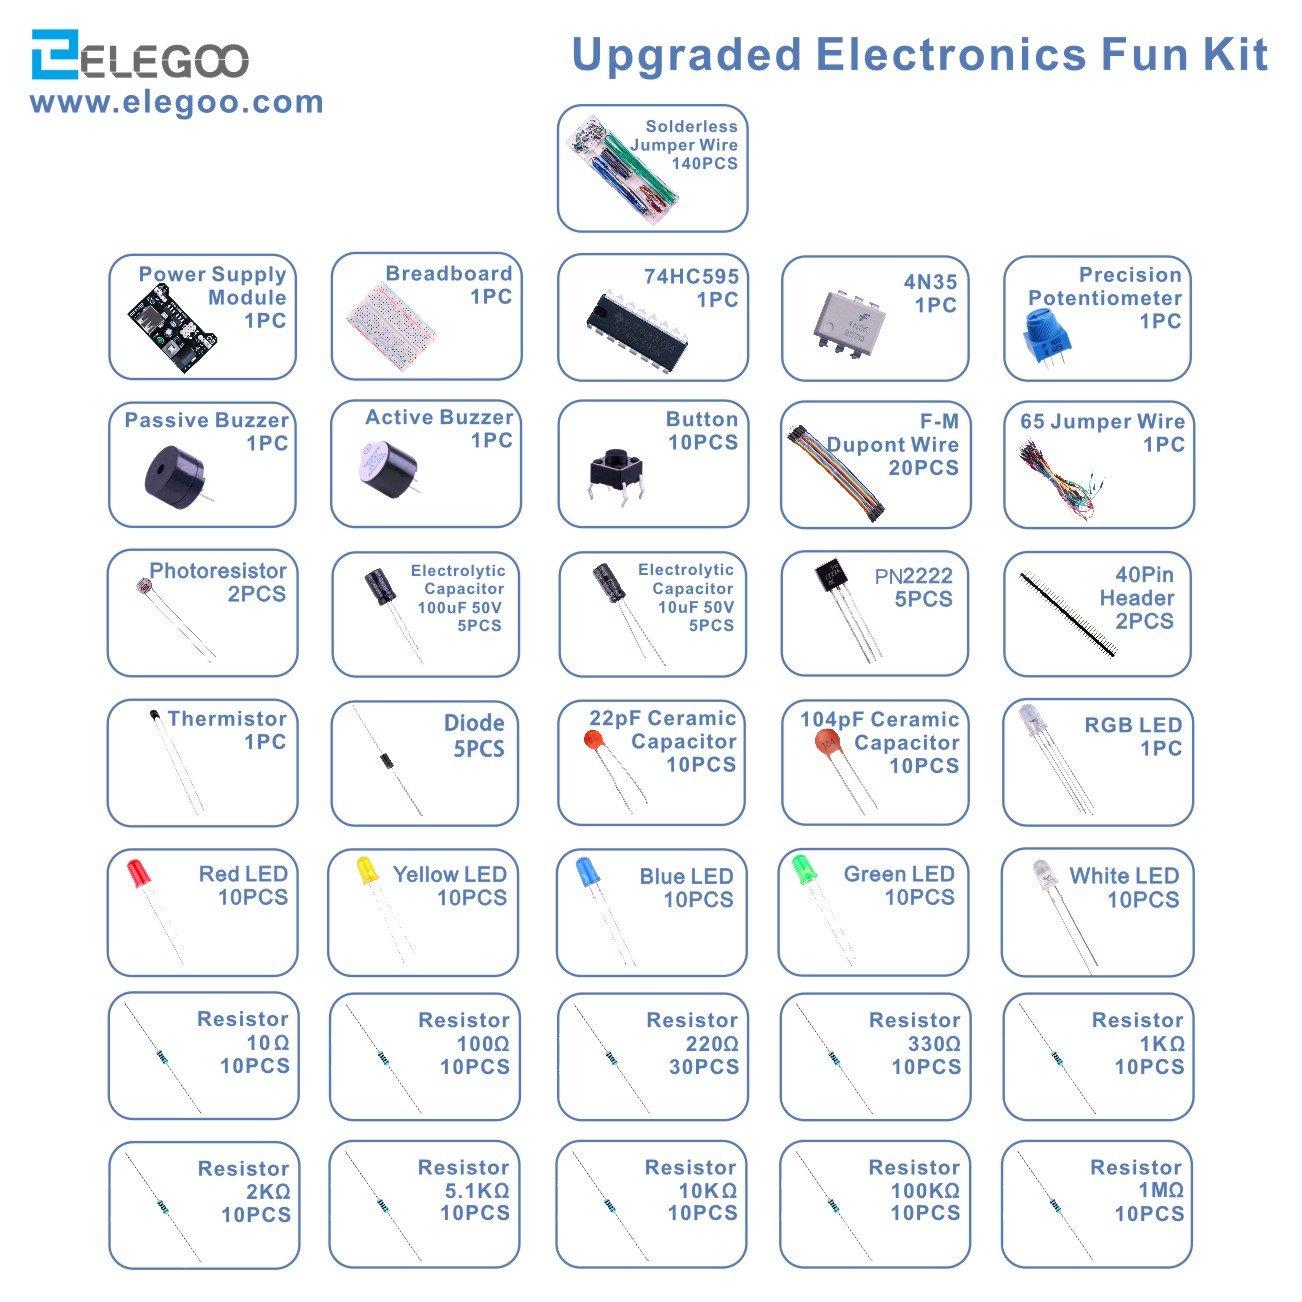 Elegoo Upgraded Electronics Fun Kit W Power Supply Breadboard With Wire Watterott Electronic Module Jumper Precision Potentiometer 830 Tie Points For Arduino